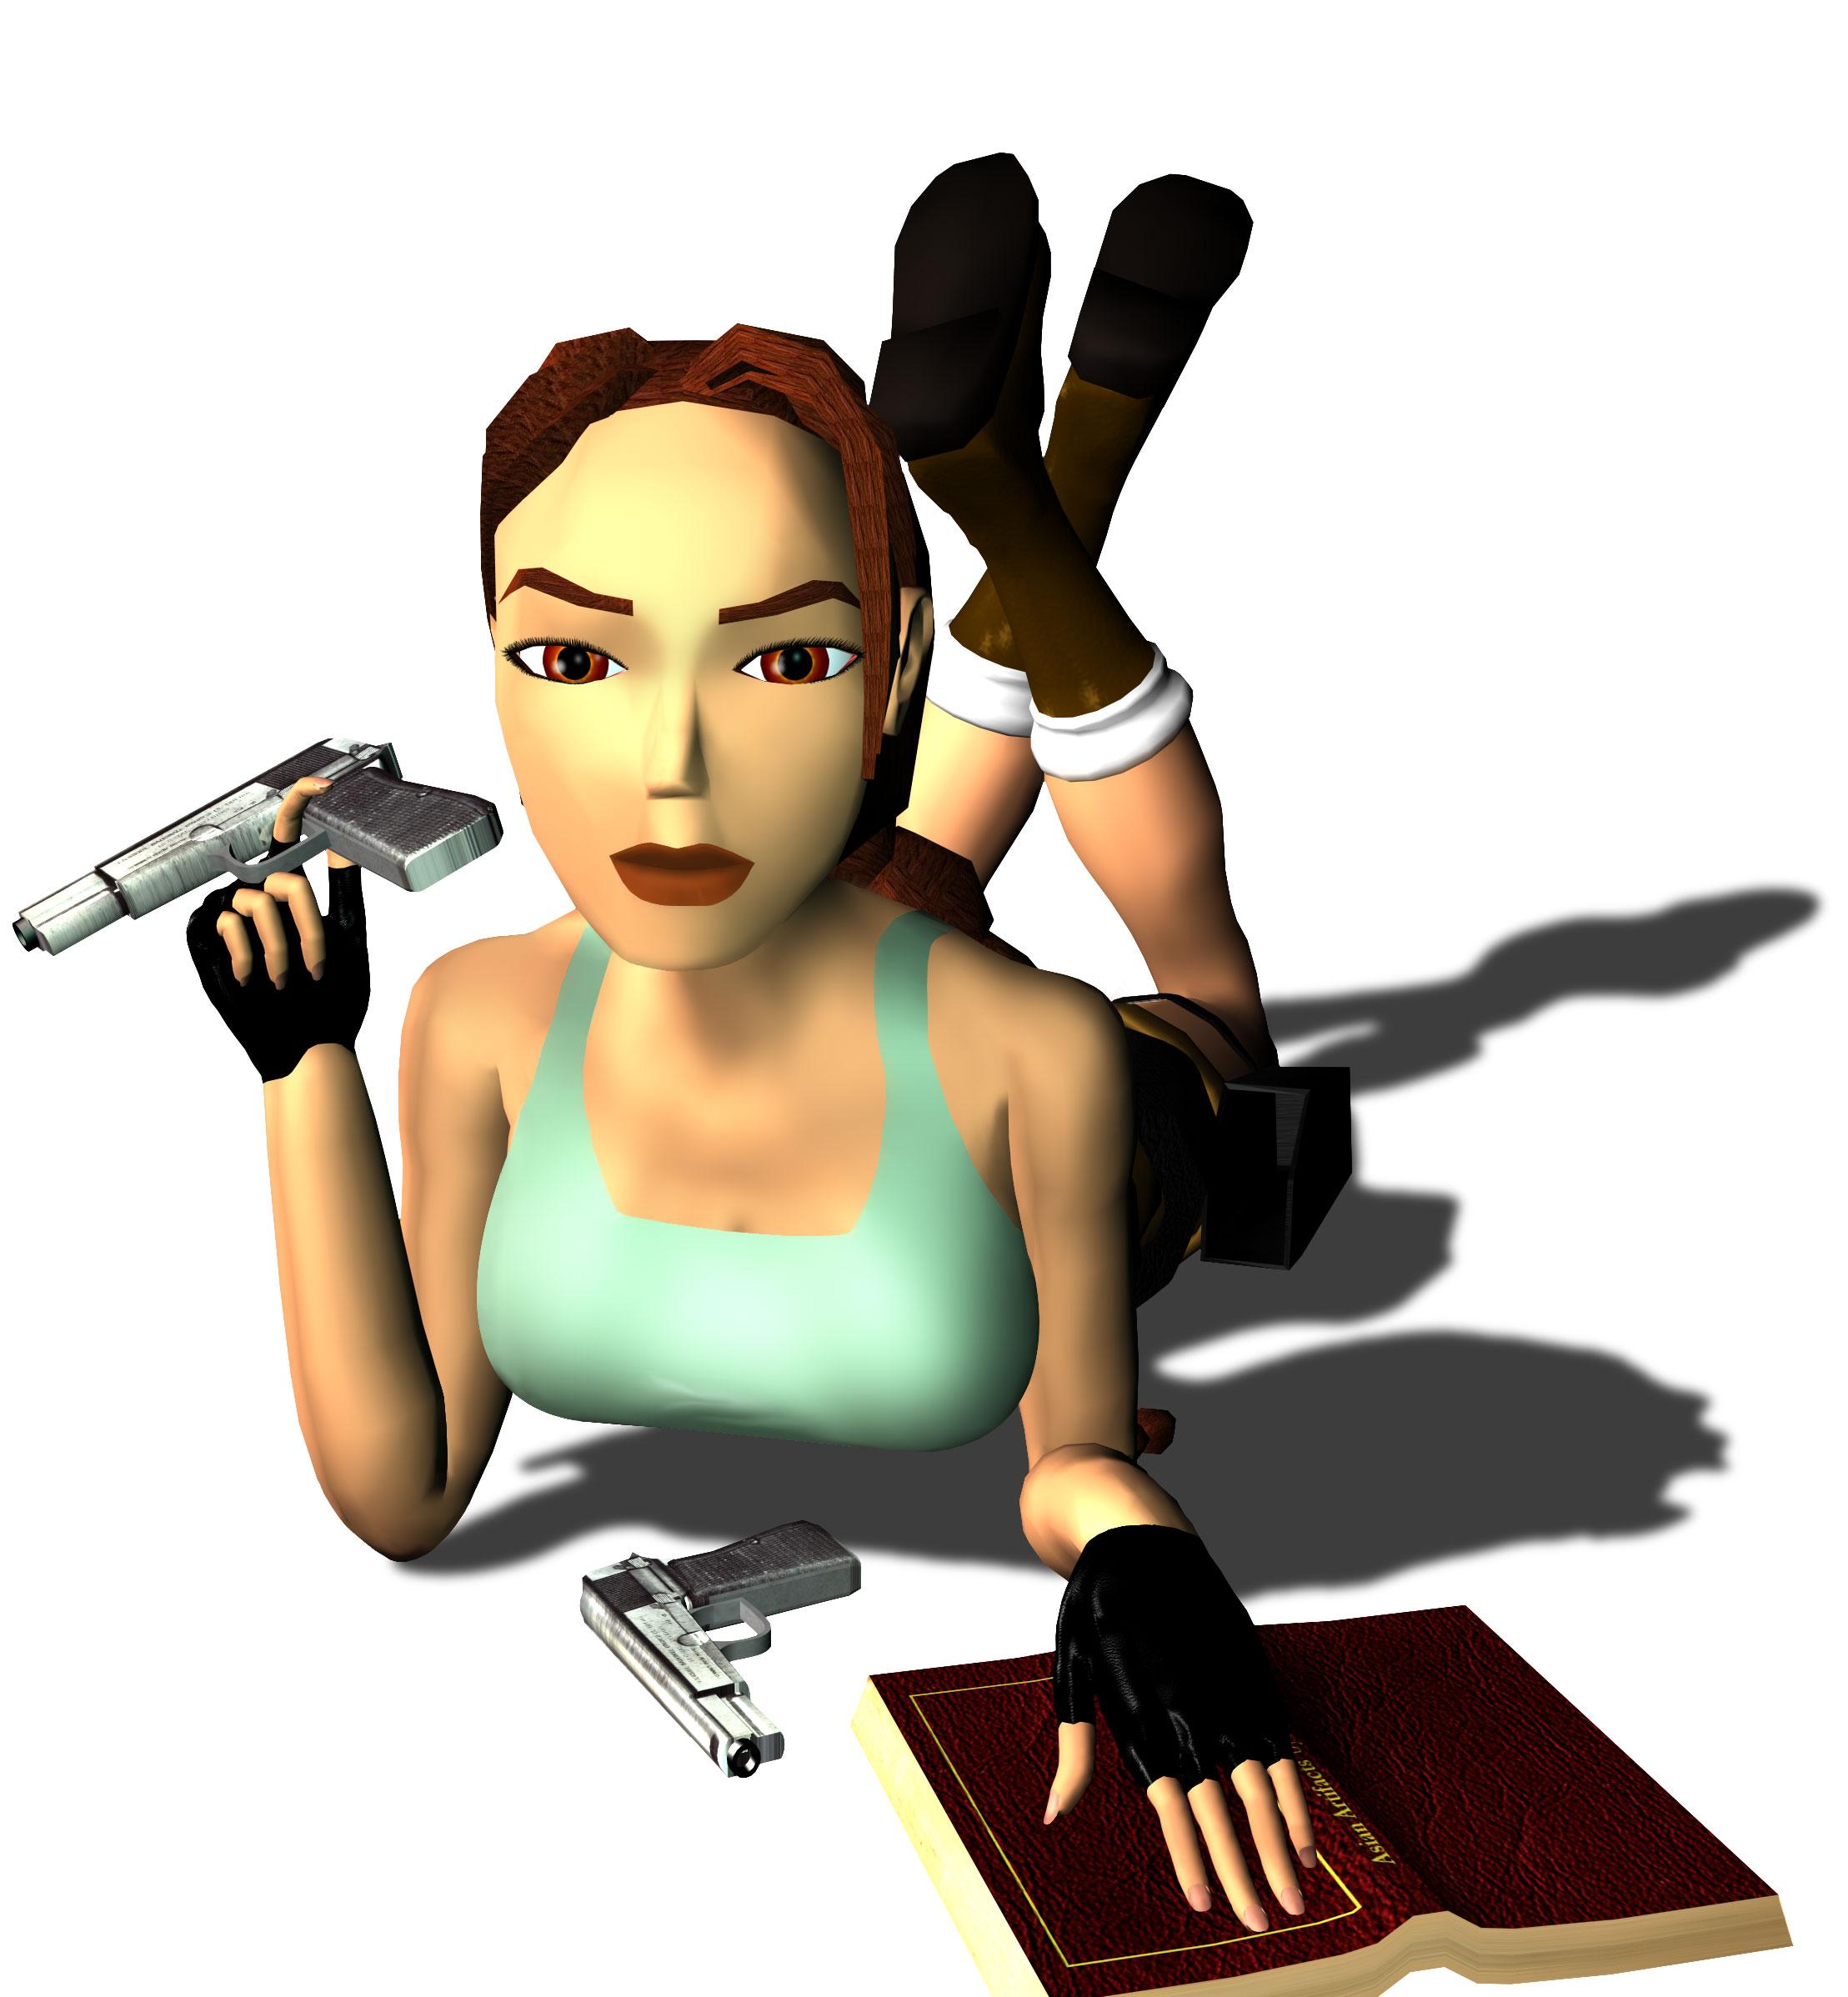 Tomb Raider III: Adventures of Lara Croft Renders